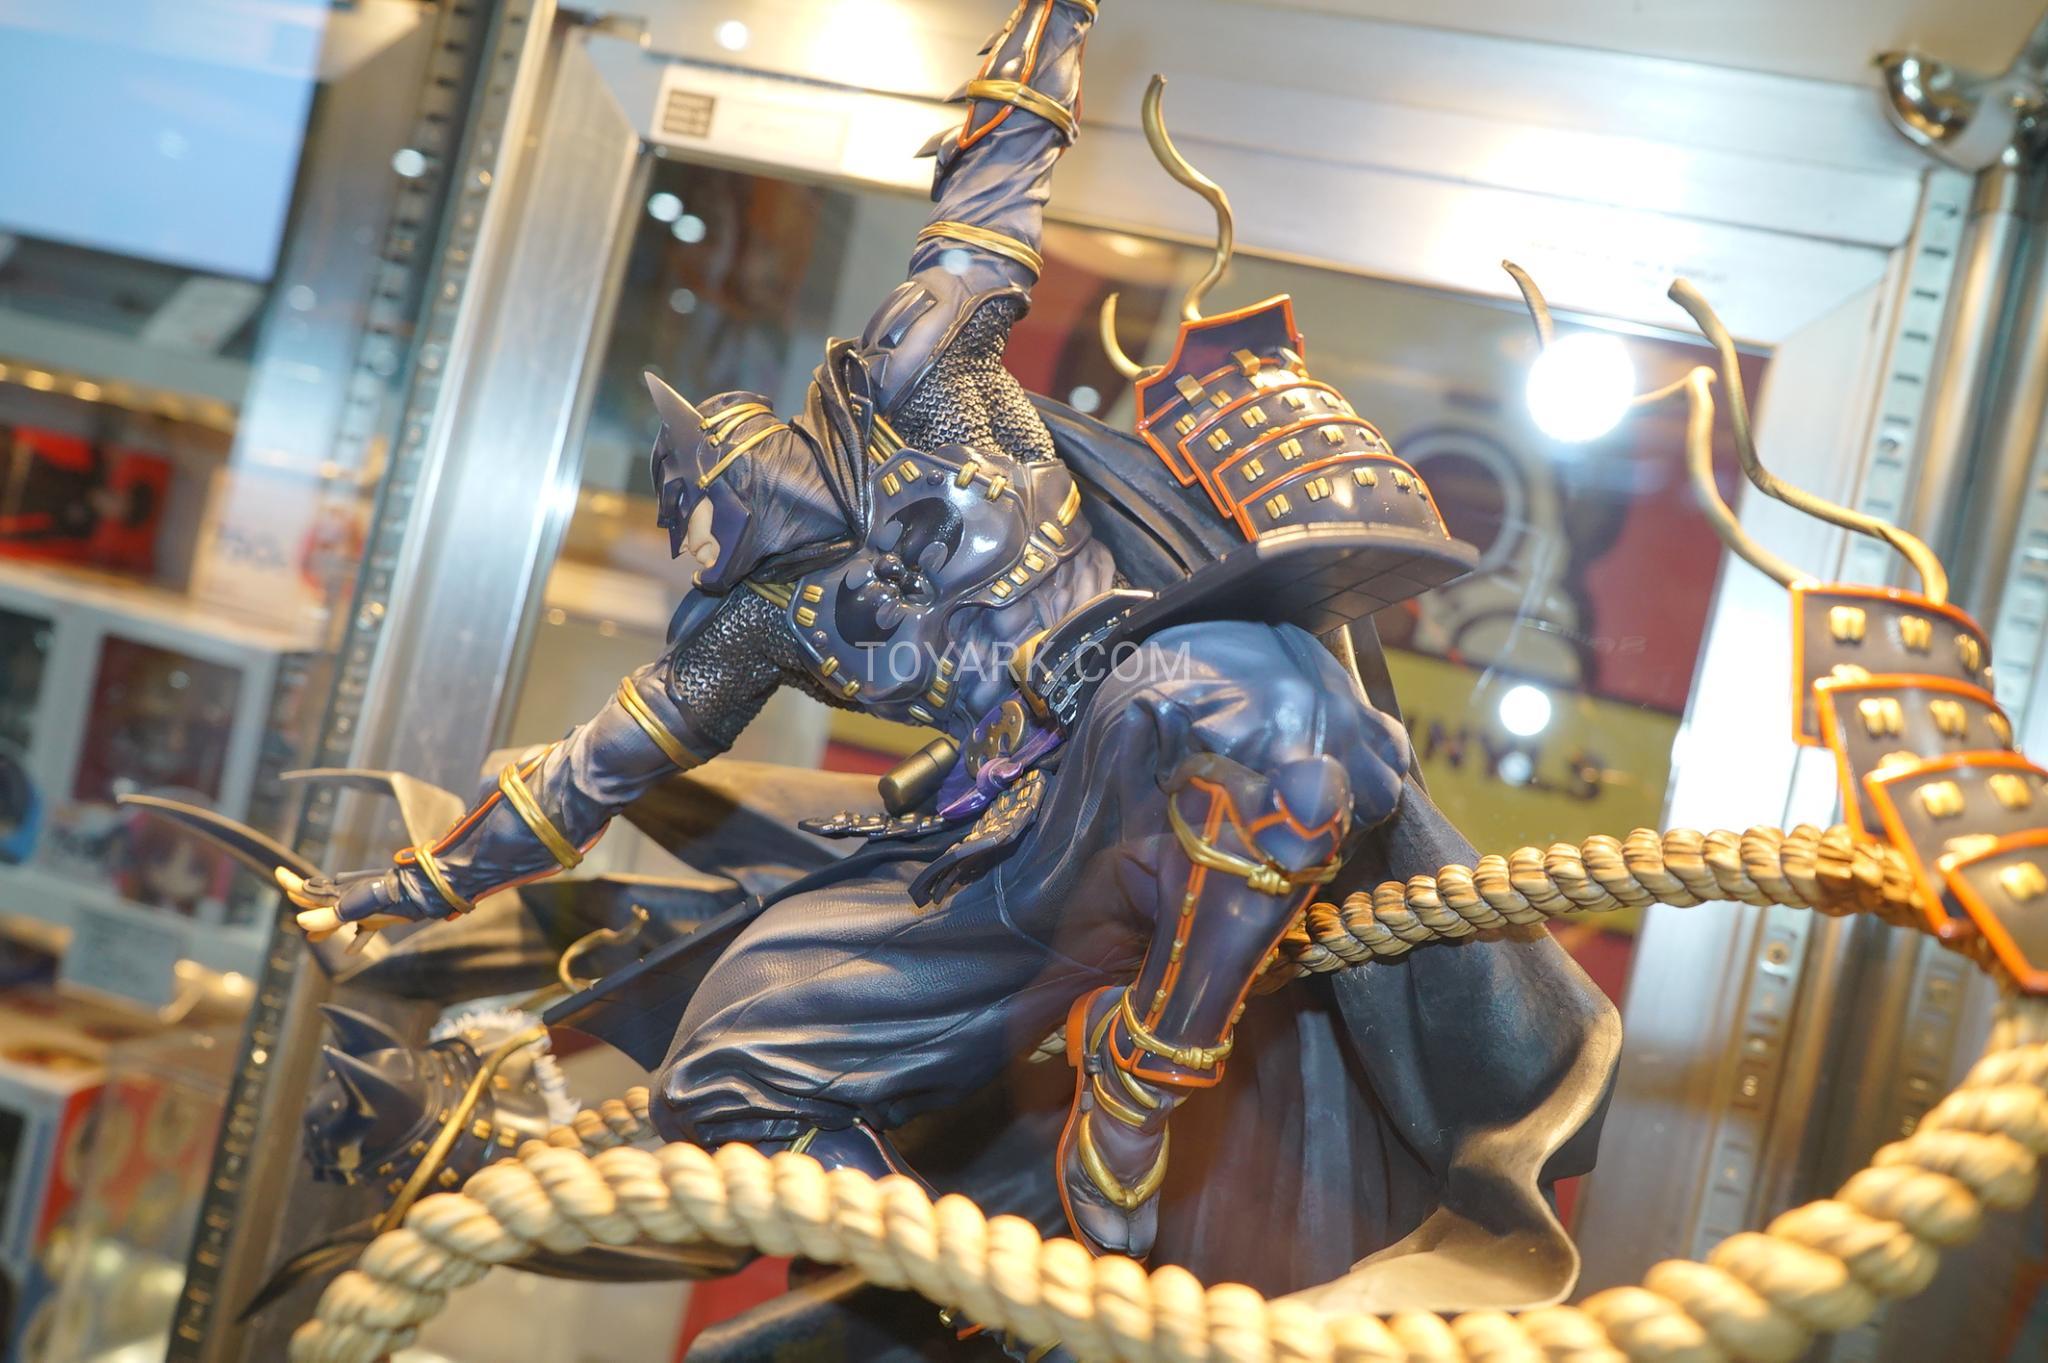 Ninja Batman Takashi Ozaki Vers. 1/6 Statue (Good Smile Company) JQH3VQMp_o